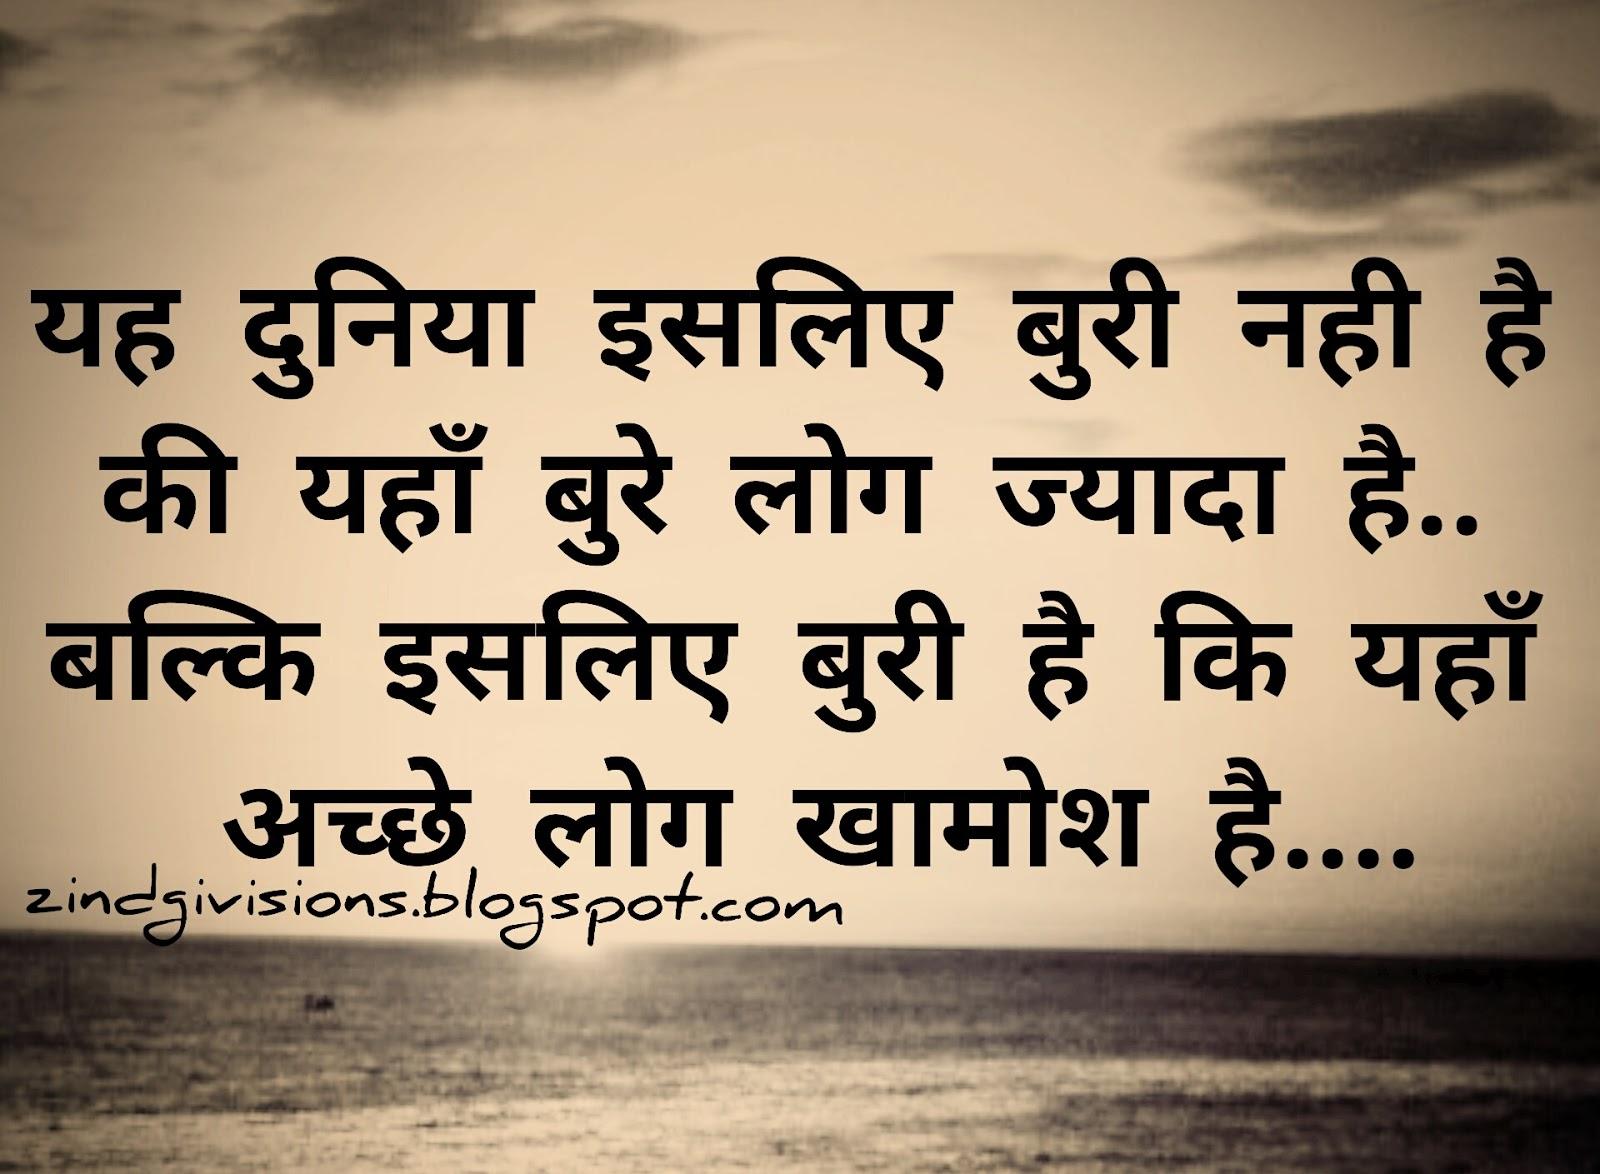 Motivational Thoughts Motivational Thoughts In Hindi 4